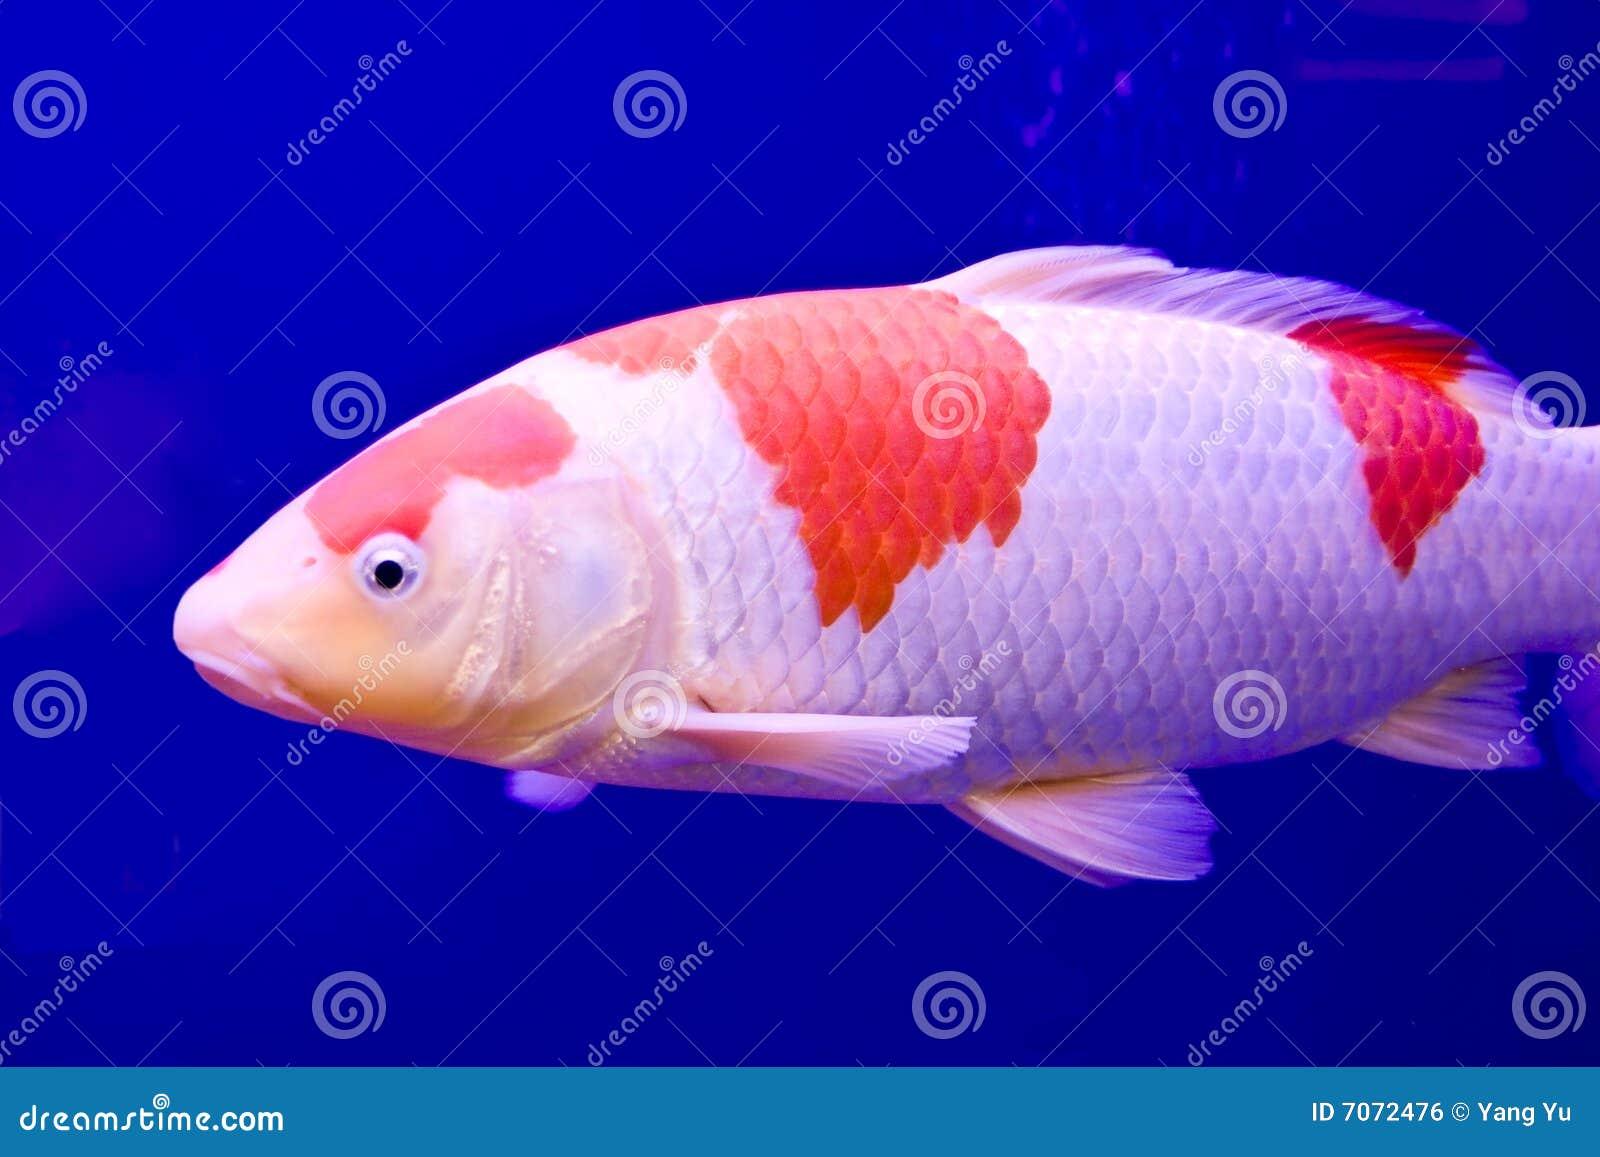 Big colorful koi carp stock image 7072477 for Koi carp colours